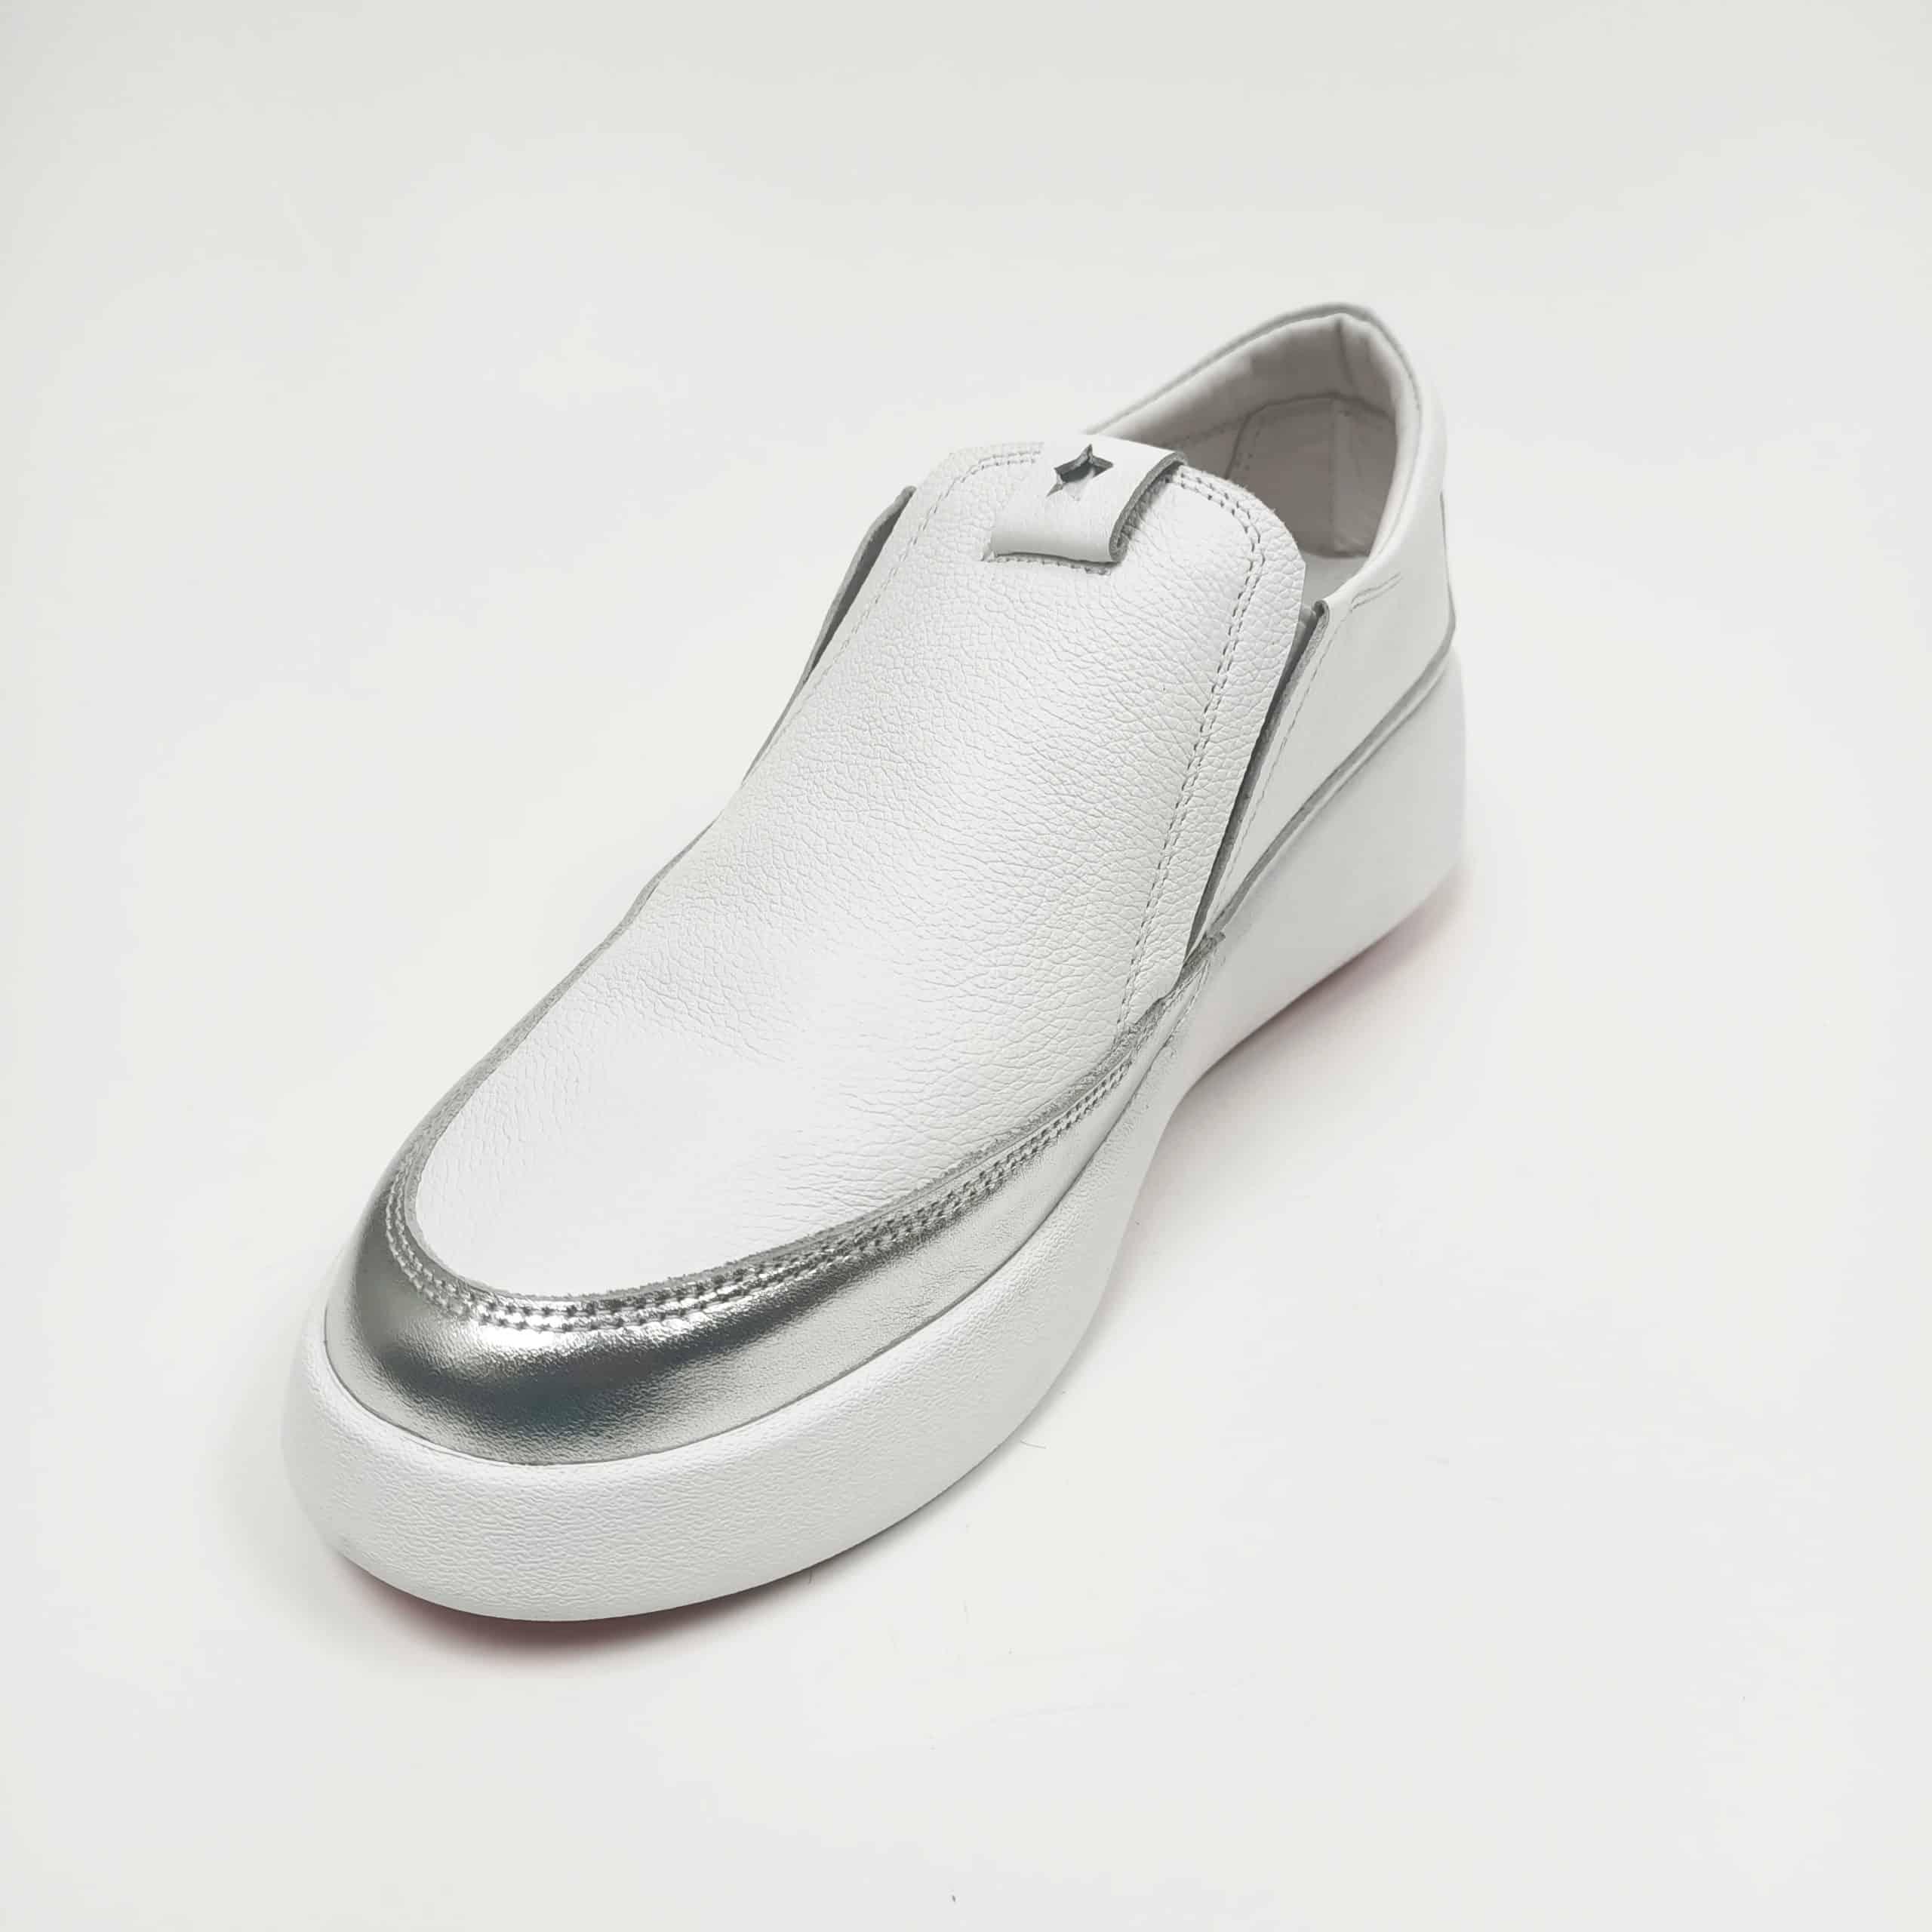 Choosen -White/Silver - Minx